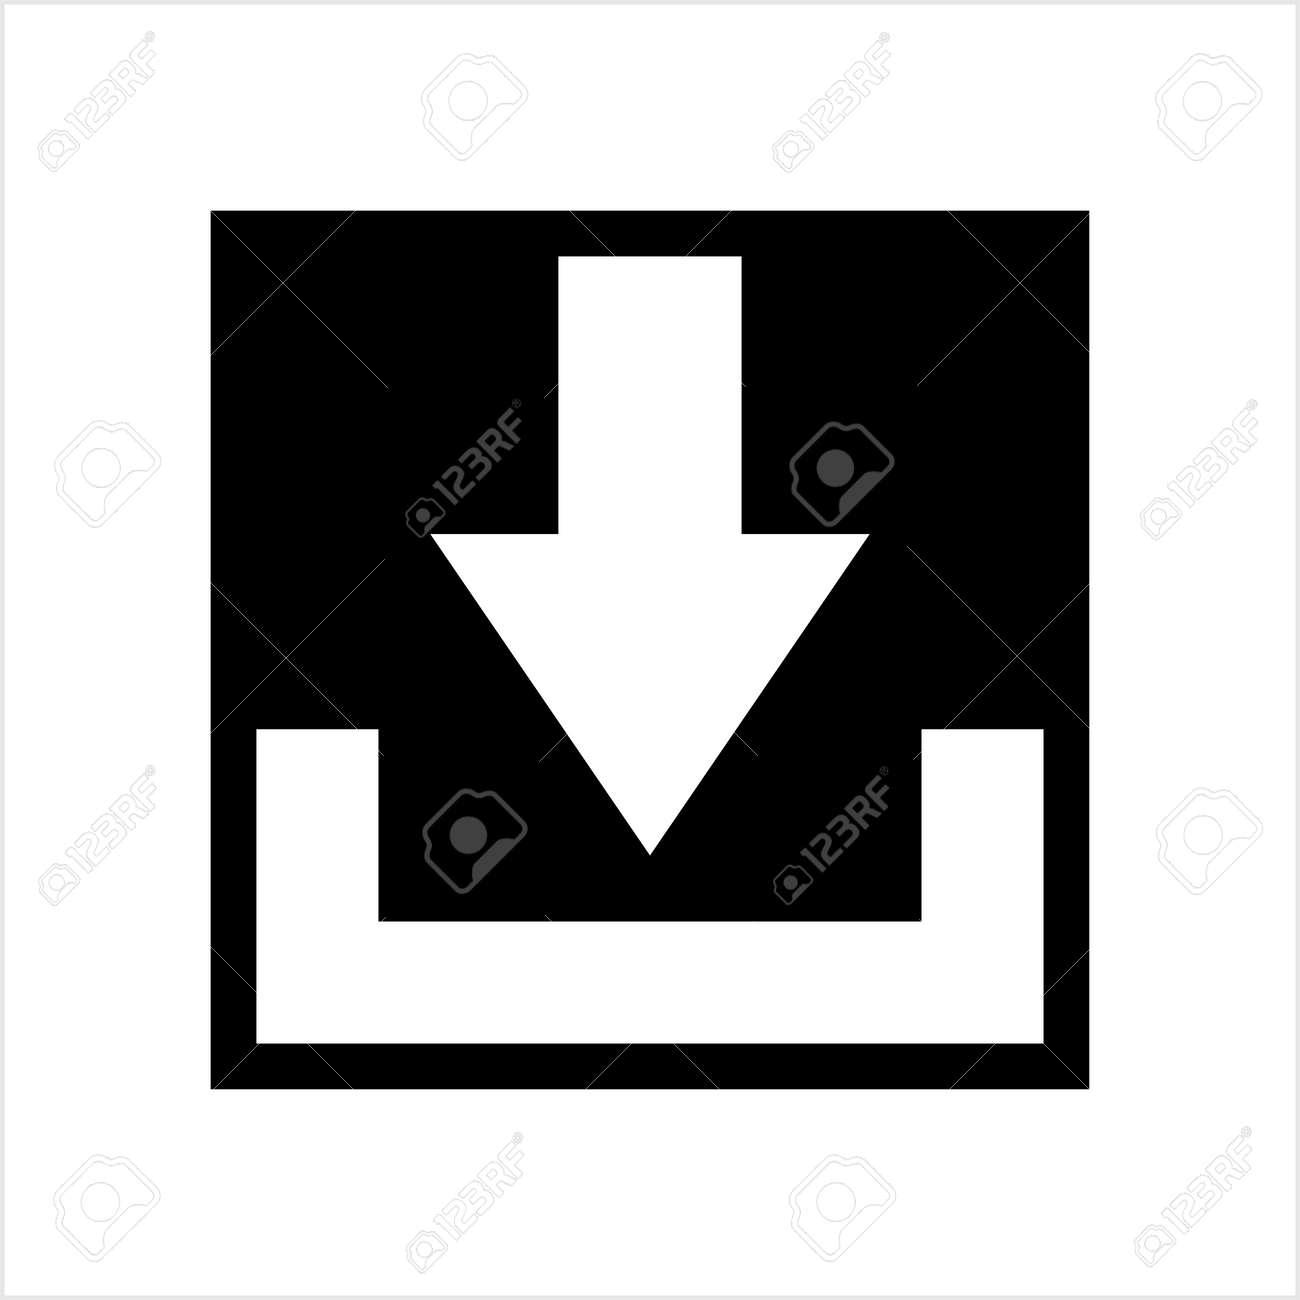 Download Icon, Download Vector Art Illustration - 148095368